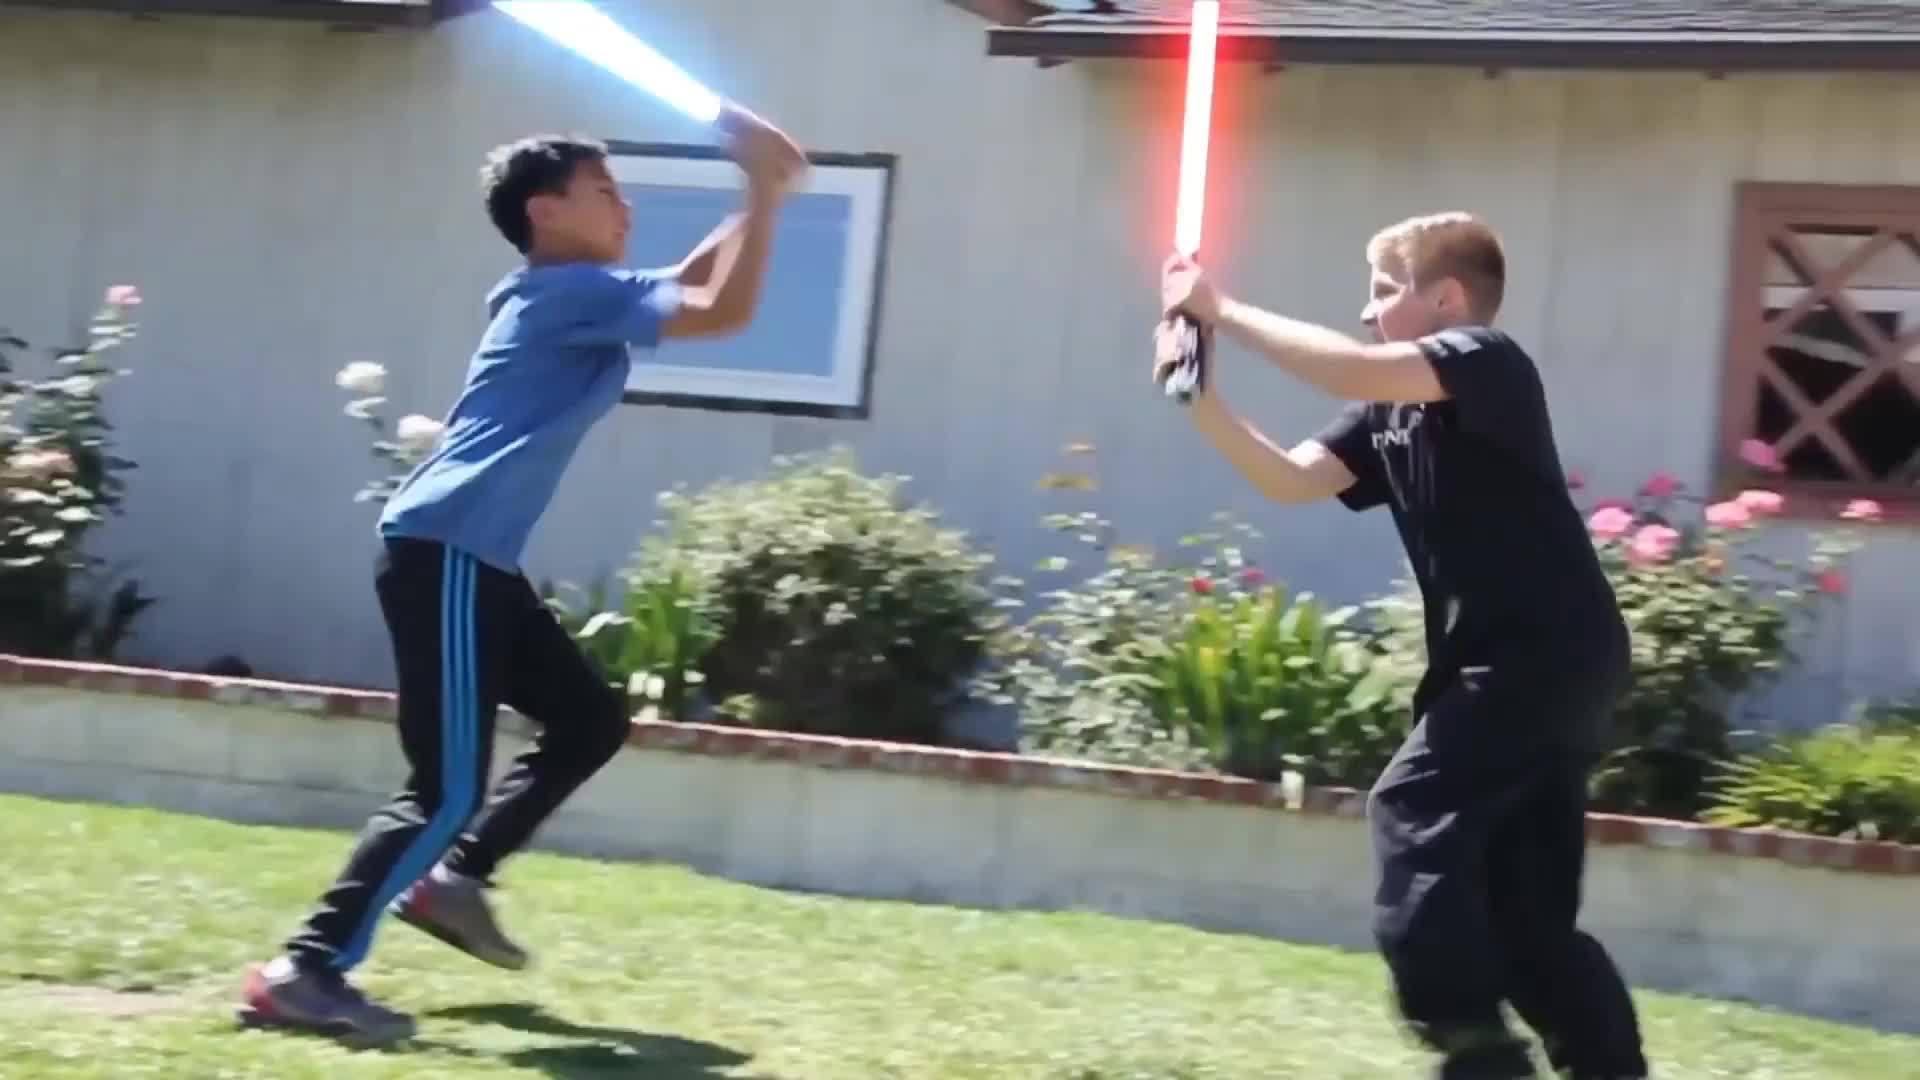 StarWars, bakanewsjp, Ahh memories... How Kids Play Star Wars (reddit) GIFs